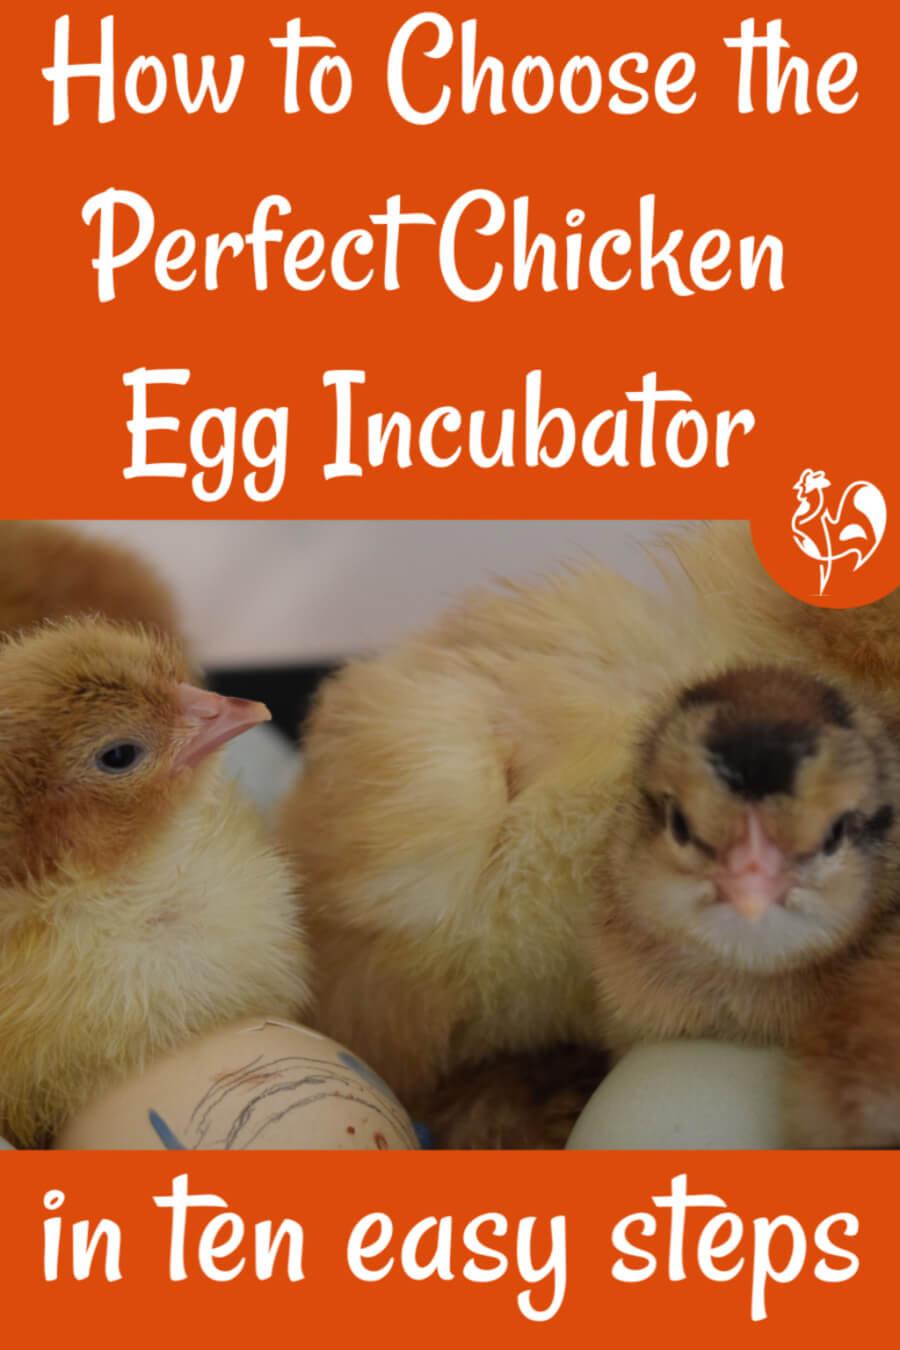 Choosing an egg incubator to meet your needs. Link.